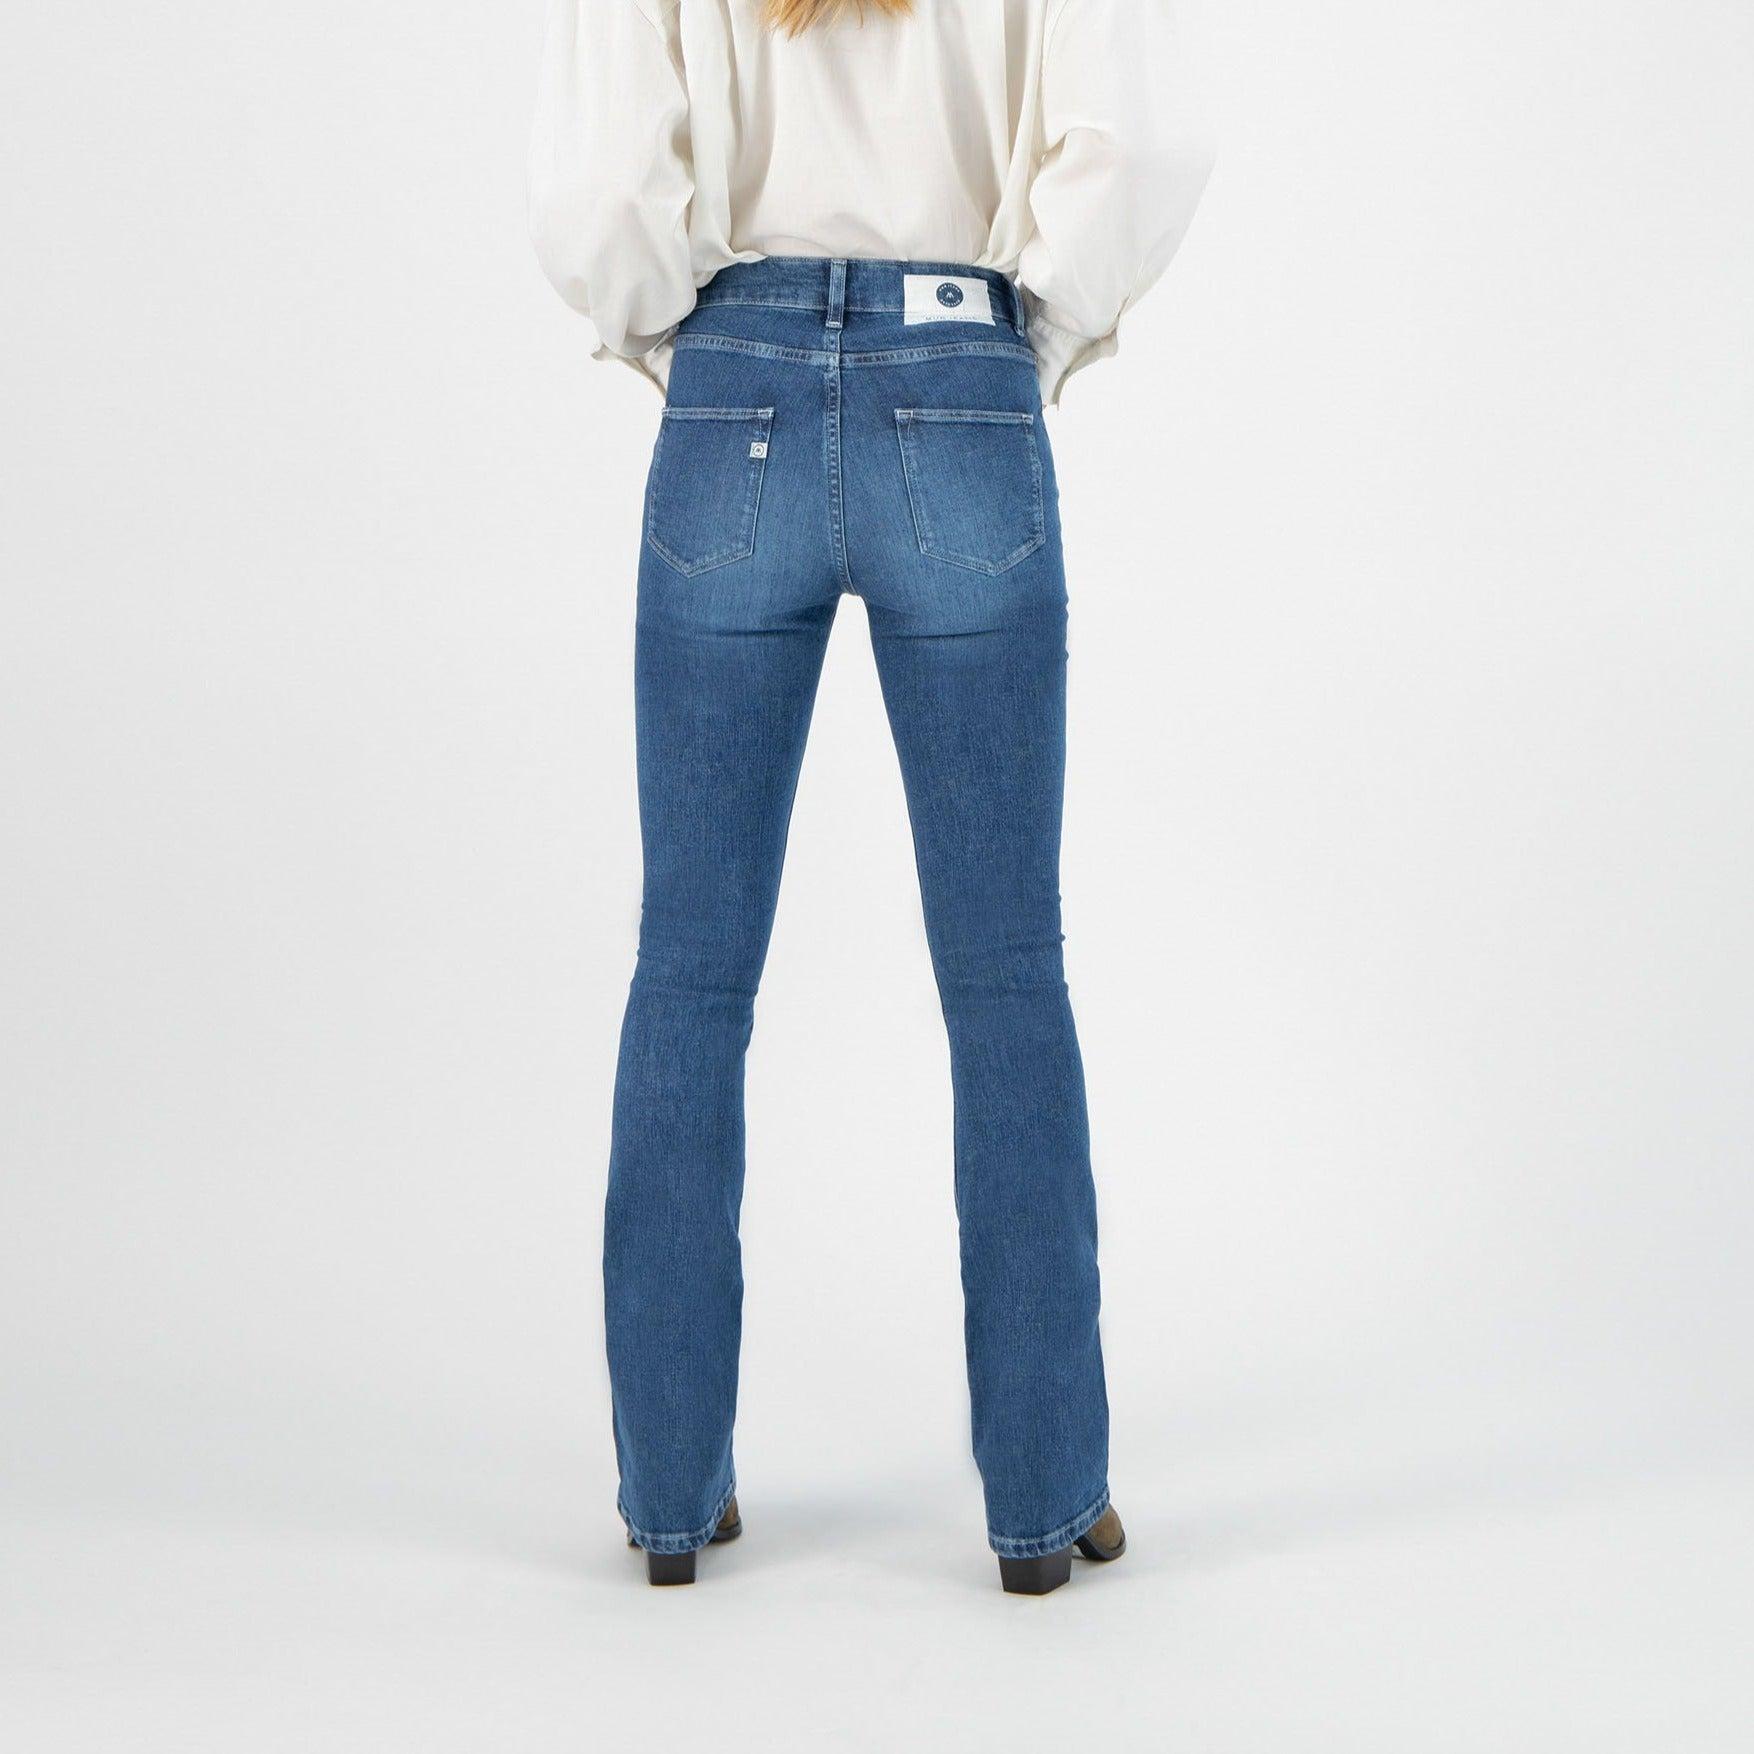 Mud Jeans Flared Hazen Authentic Indigo